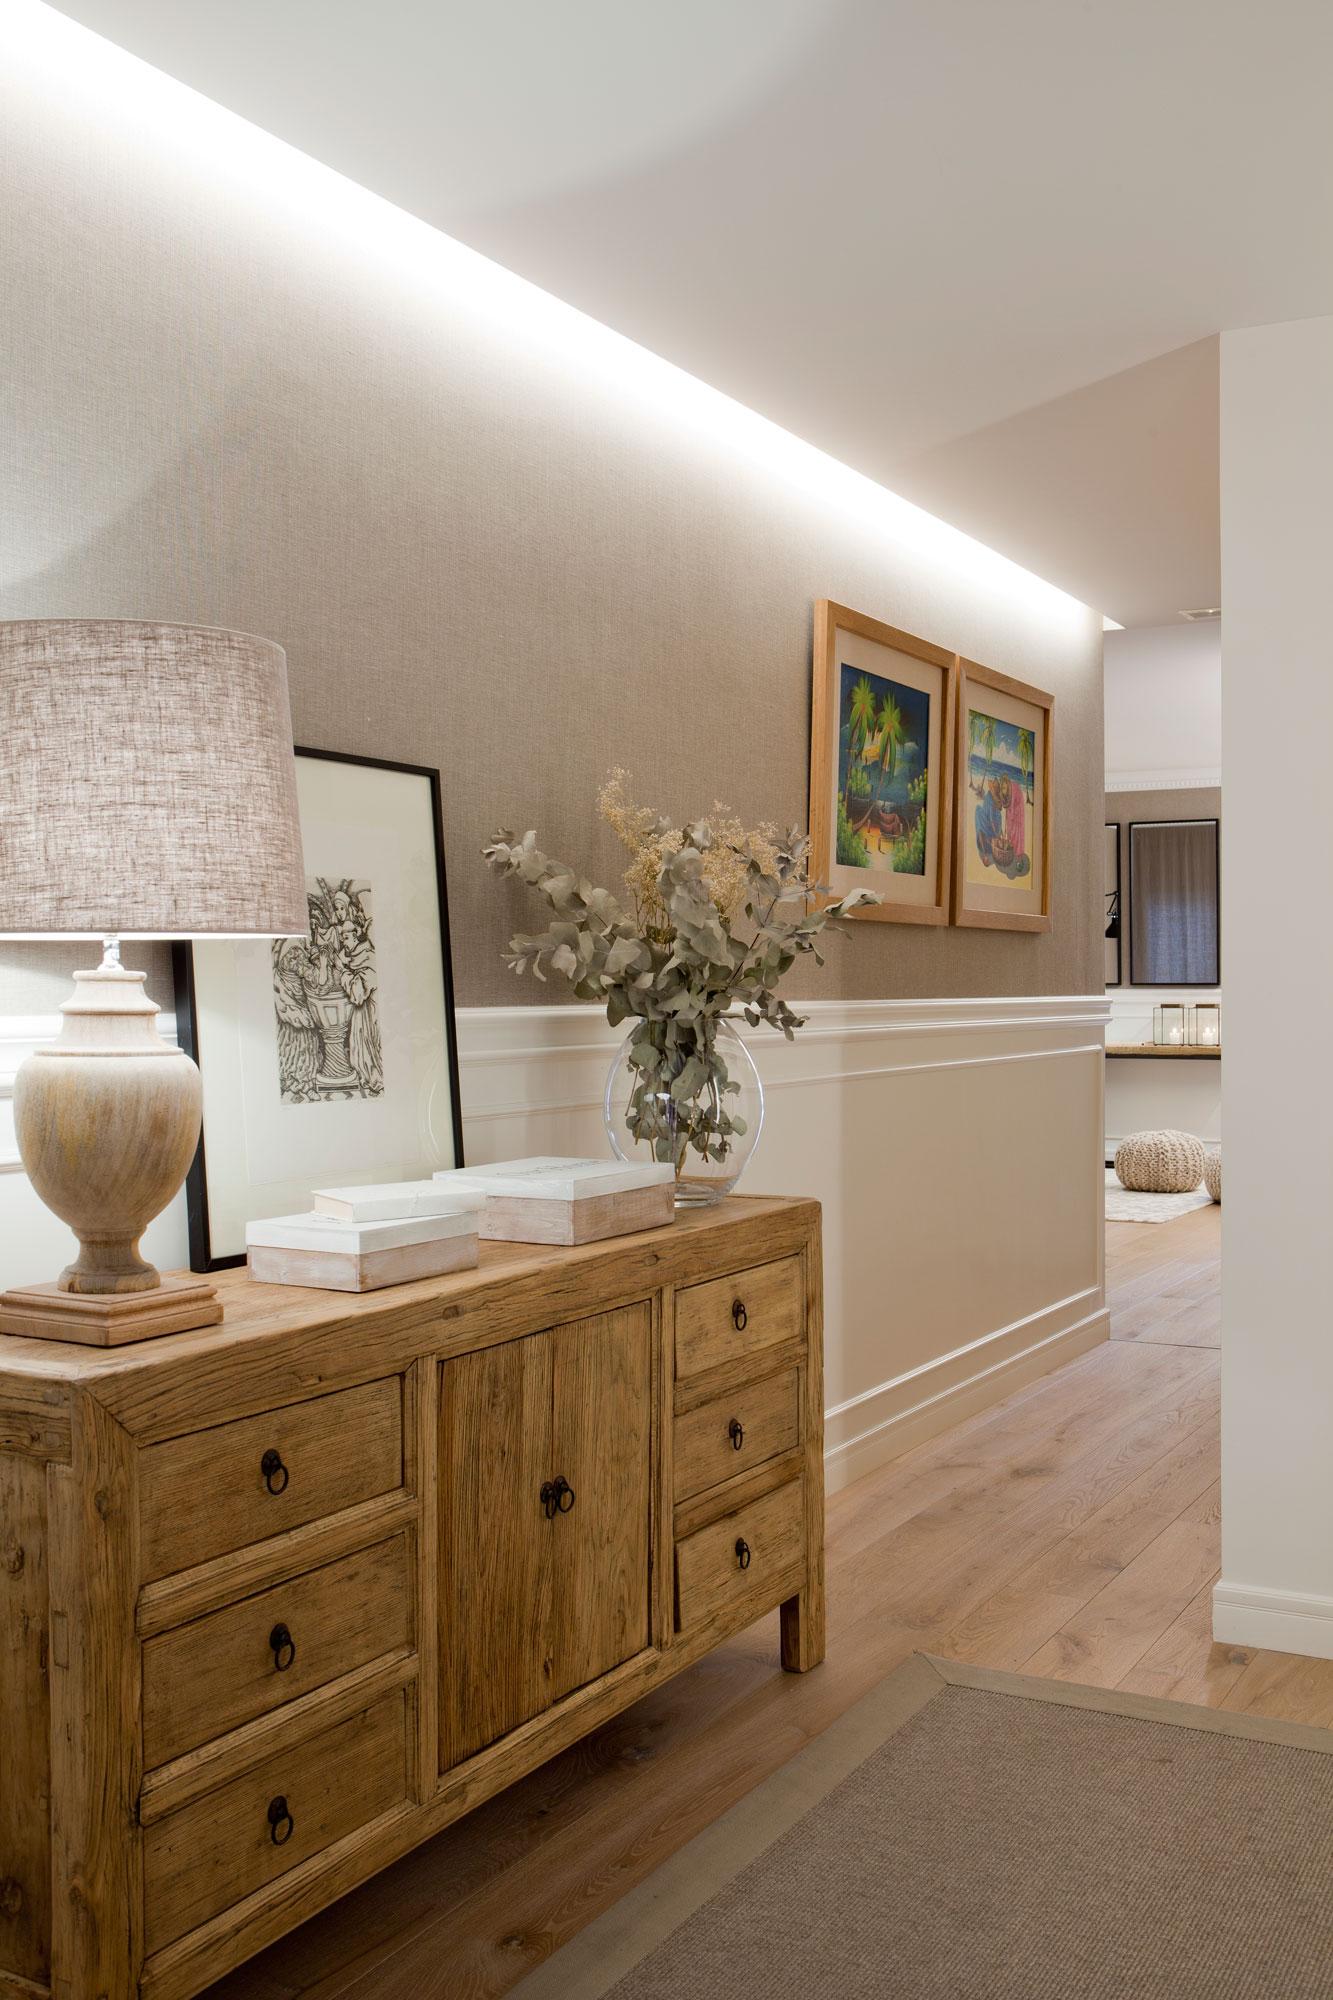 C mo iluminar tu casa sin cometer los errores m s habituales for Luces para exterior de casa